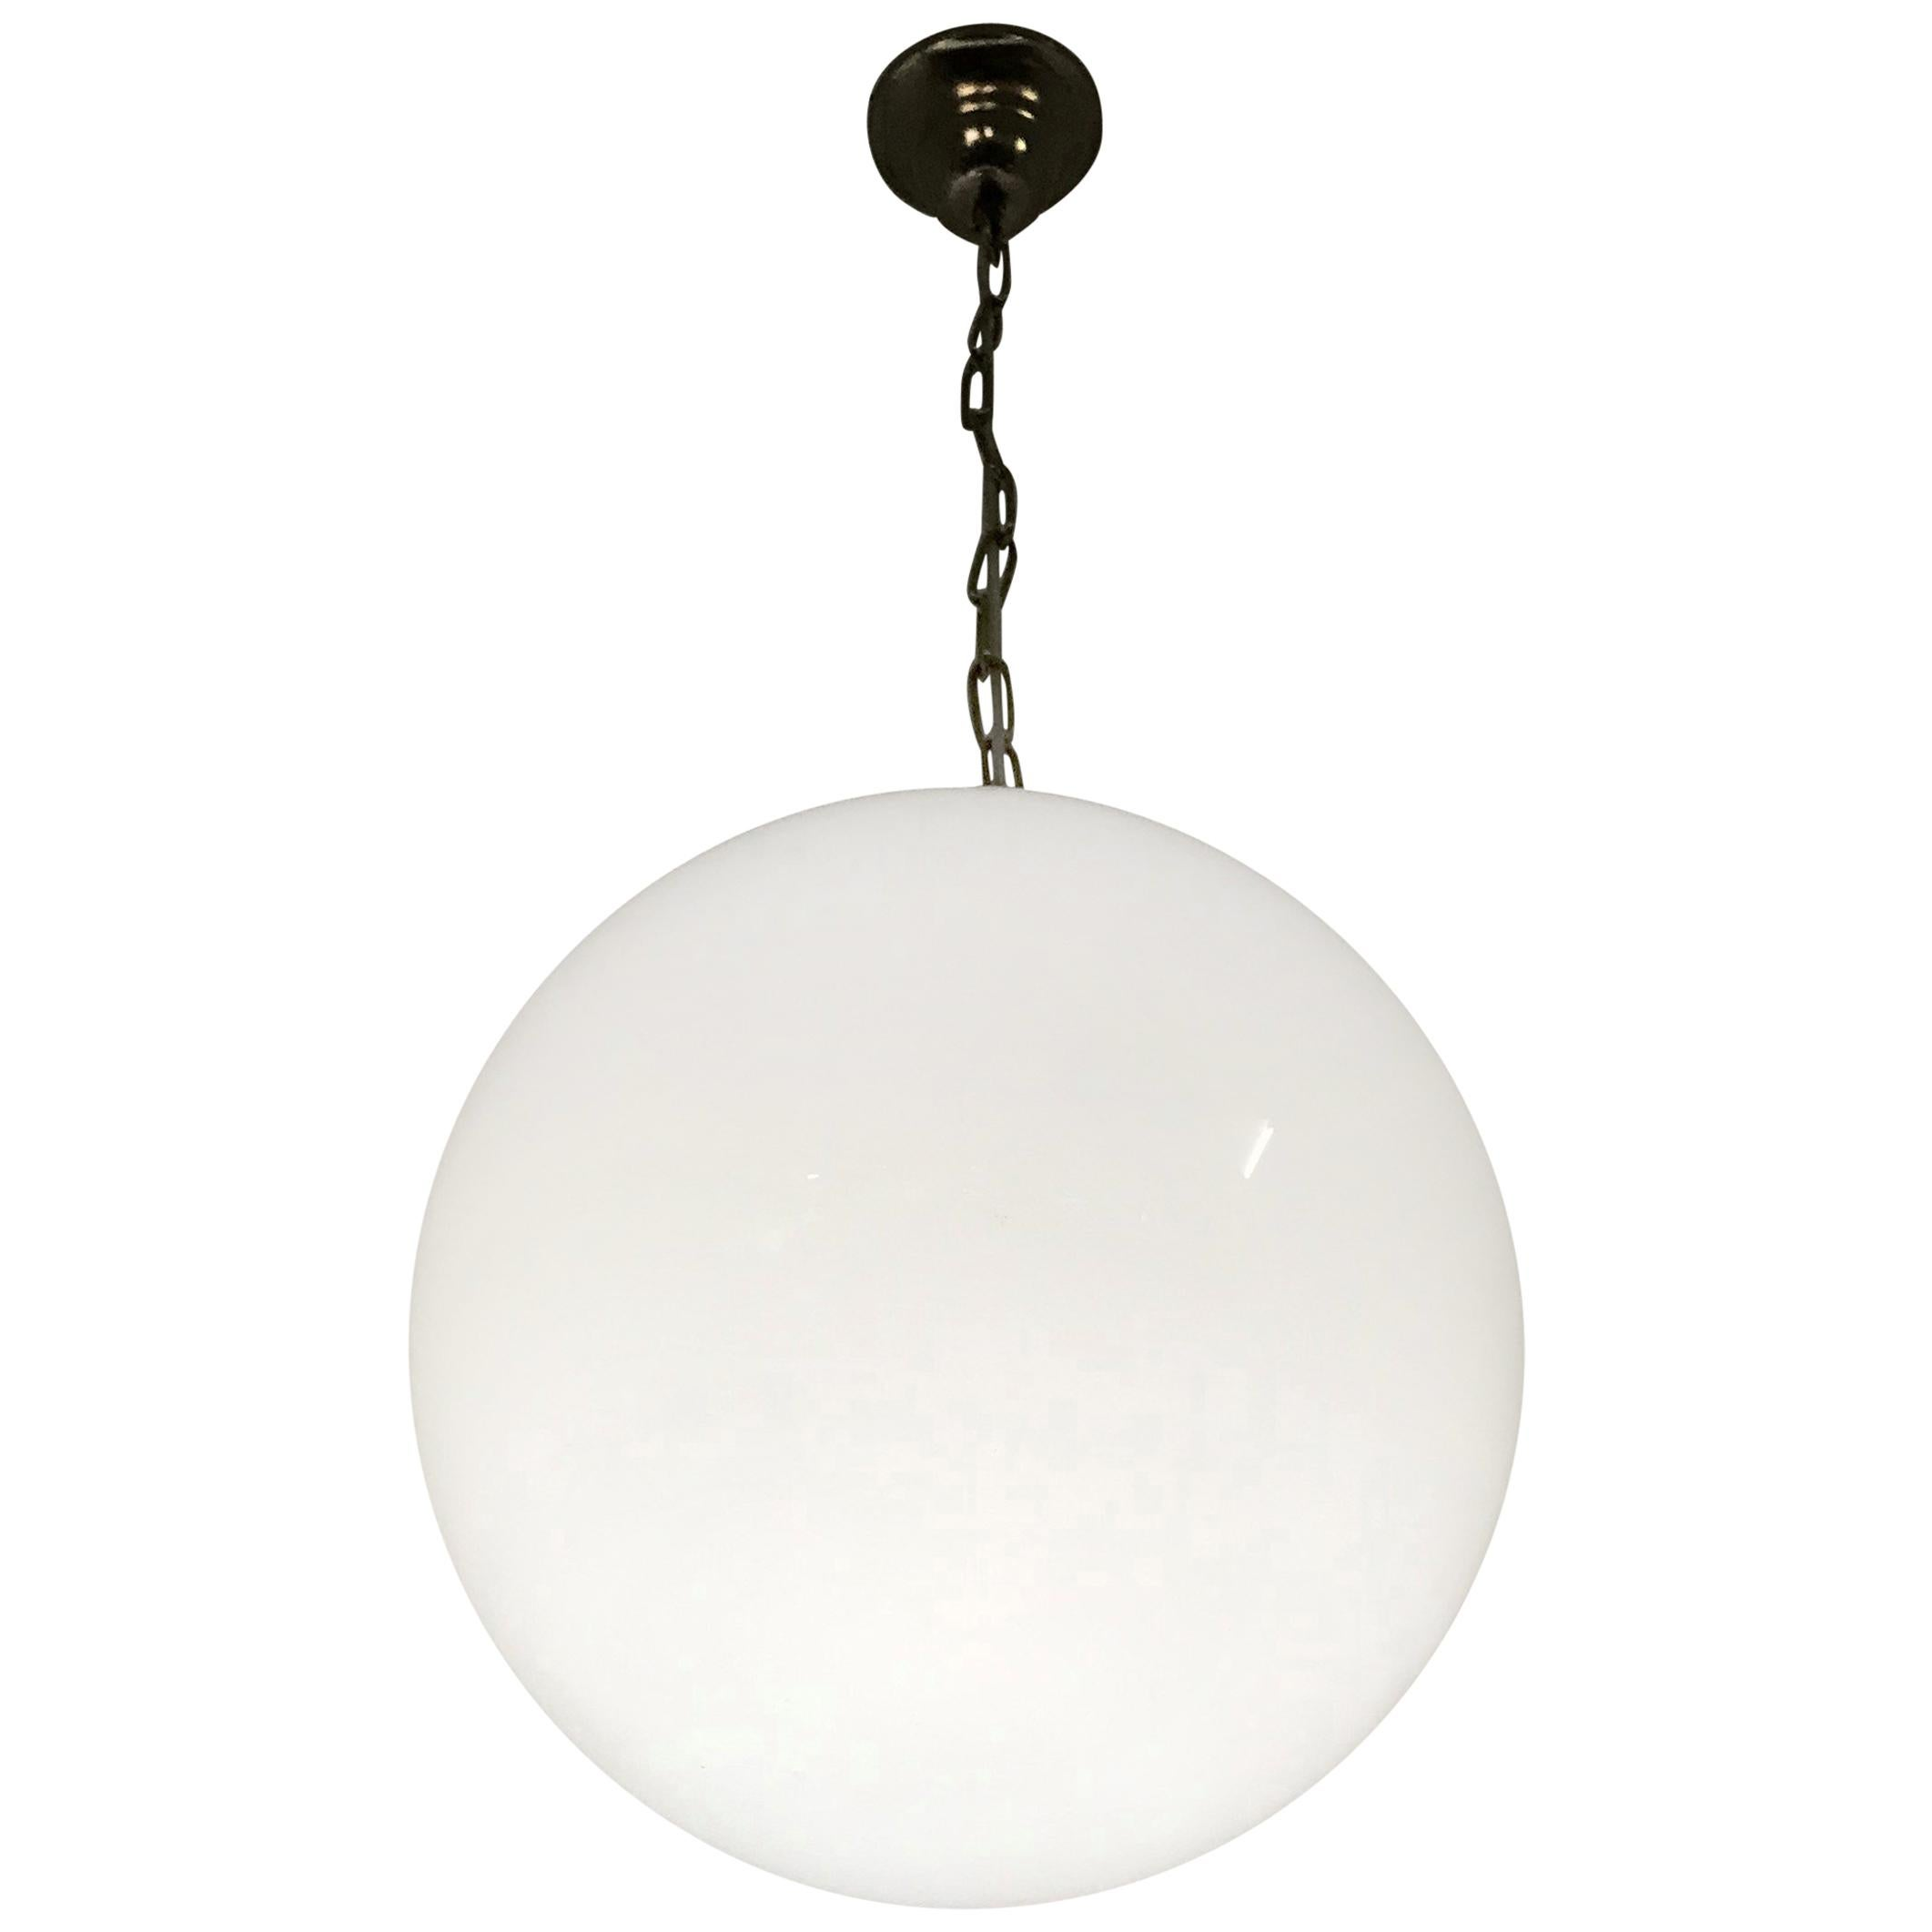 2 Large Mid-Century Modern Murano Opaline Glass Sphere Chandeliers, circa 1970